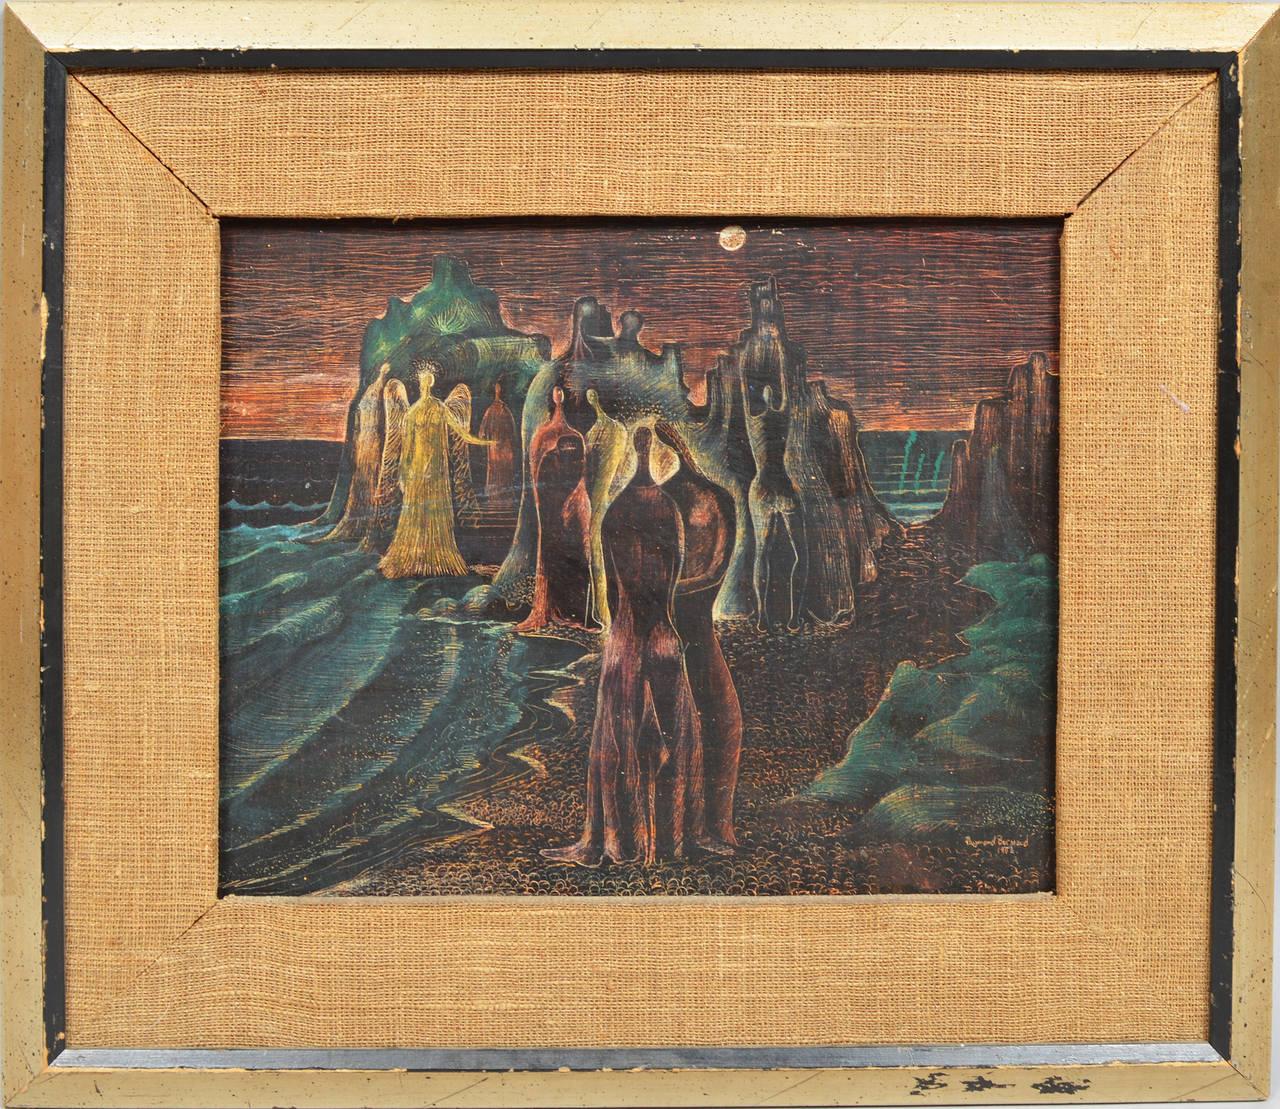 The Beach Gathering - Painting by Raymond Brossard